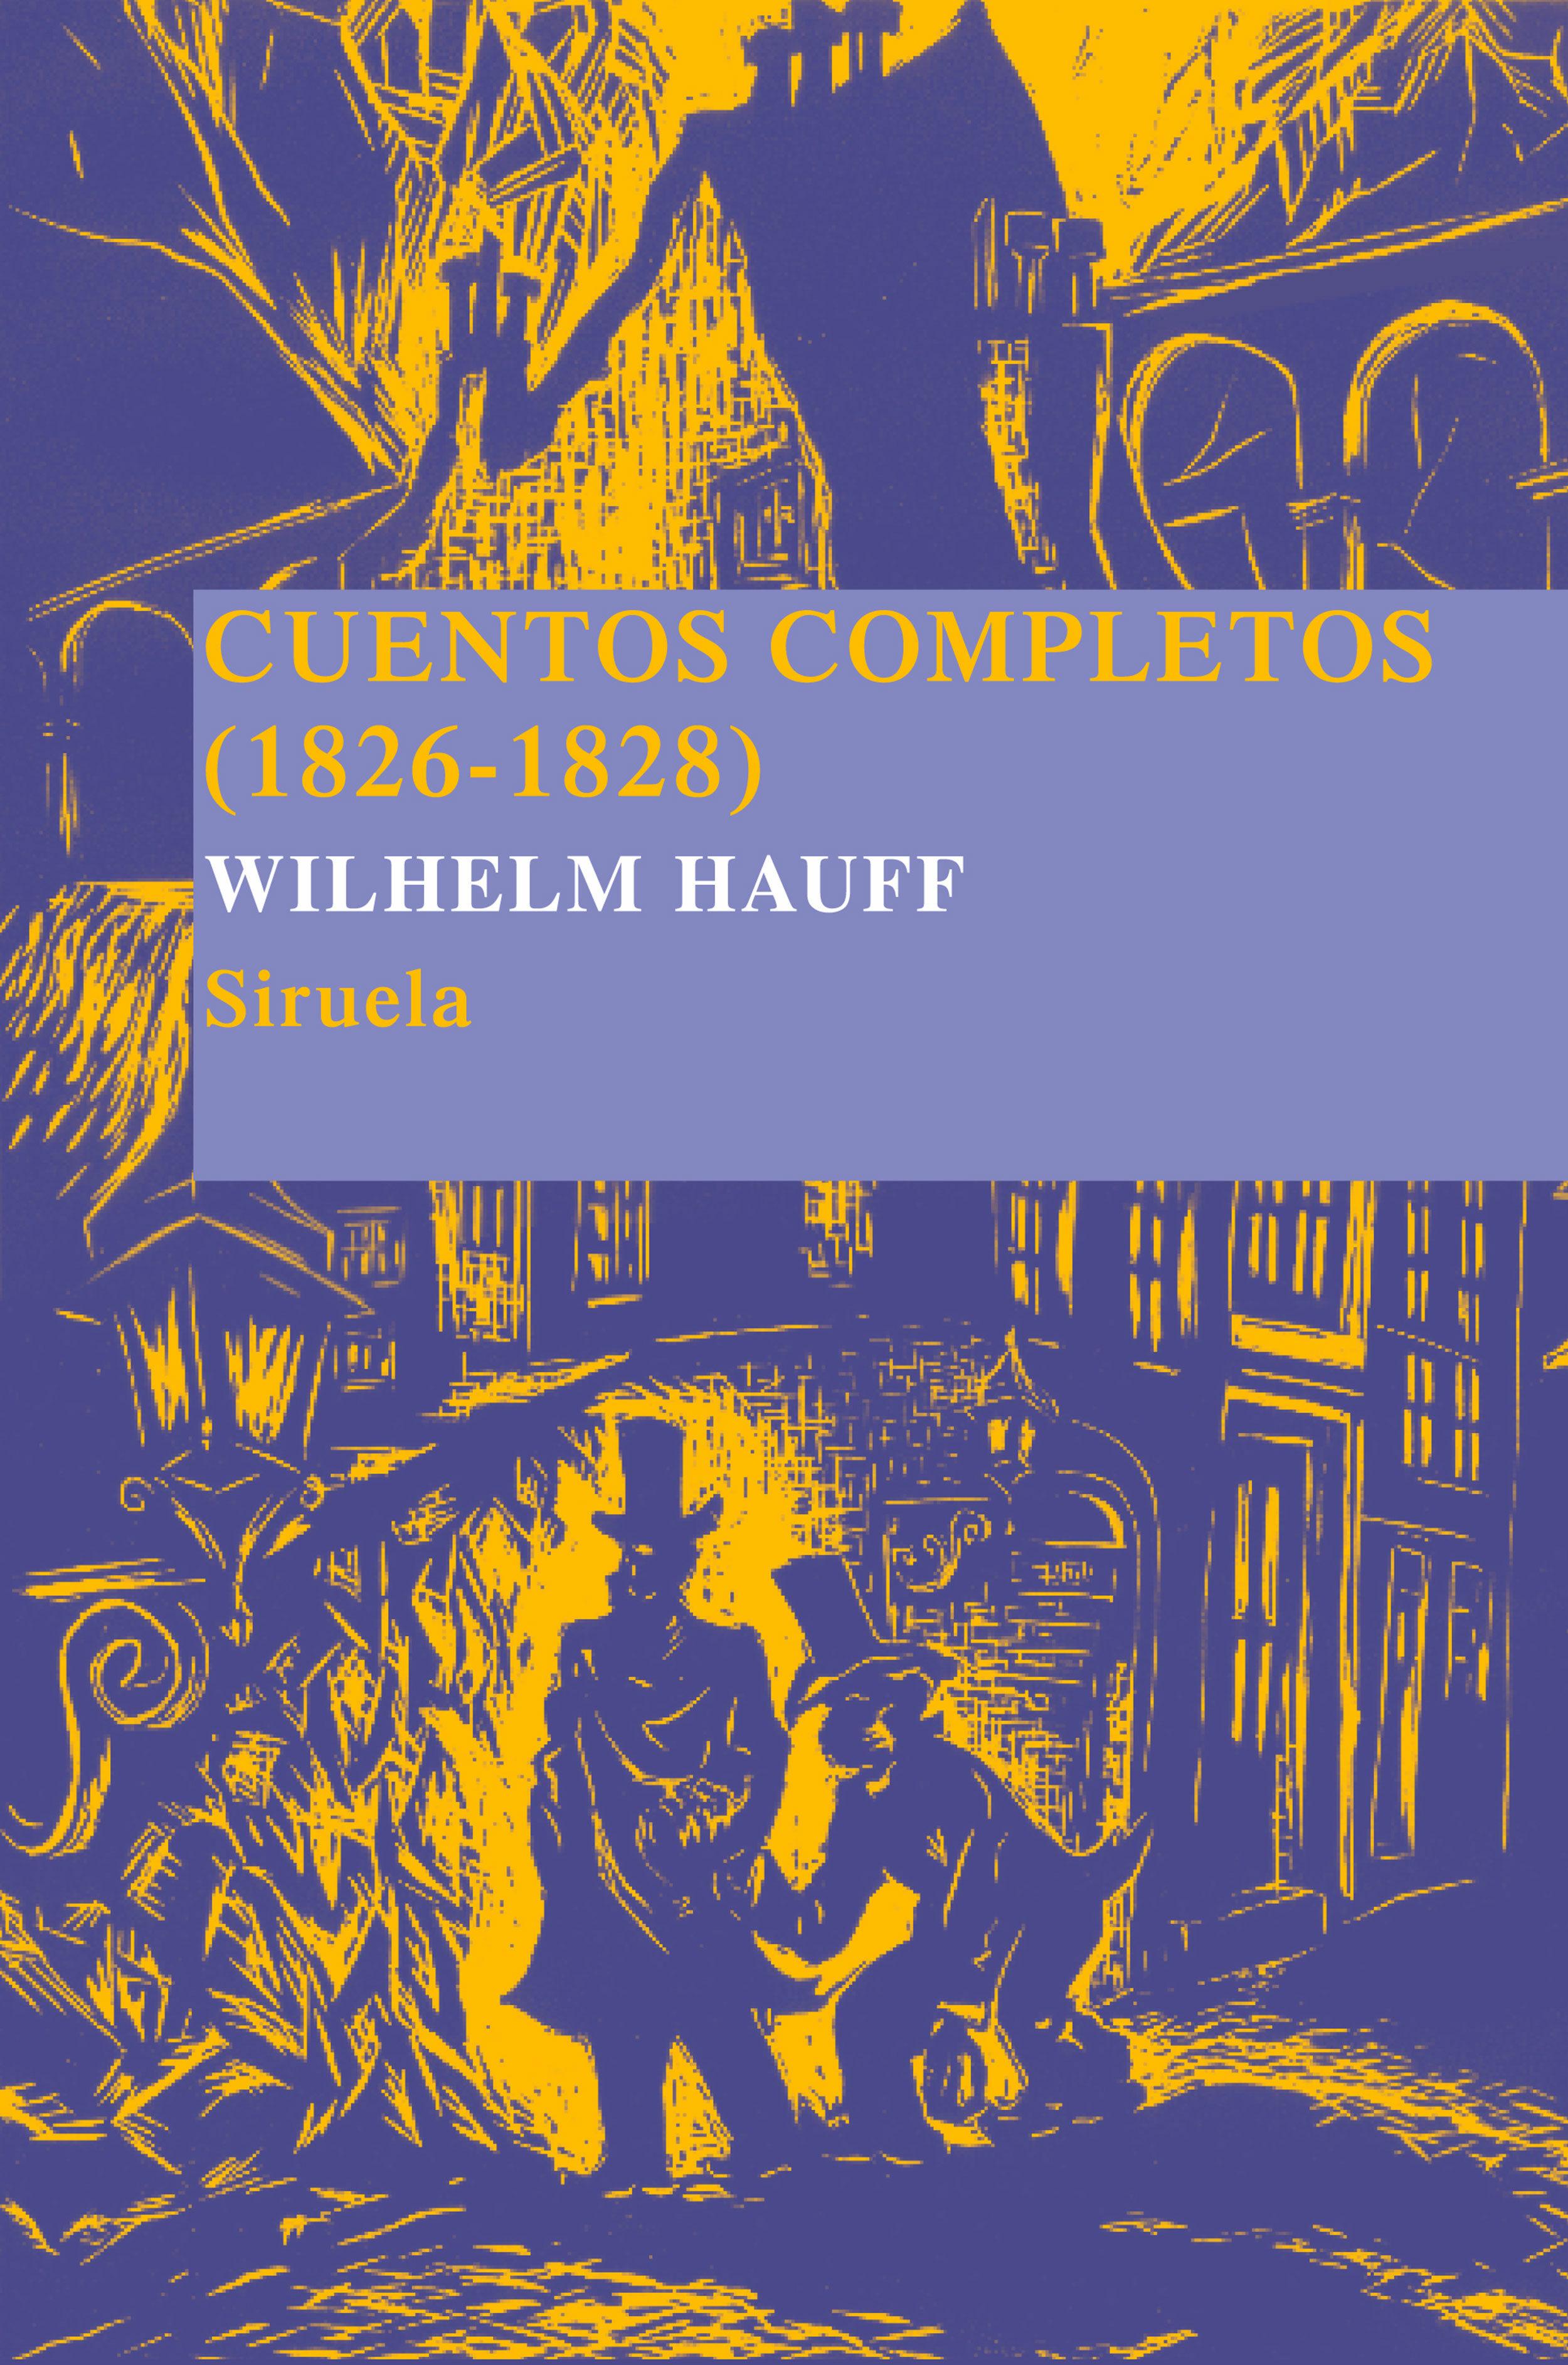 Cuentos Completos (1826-1828) - Hauff Wilhelm